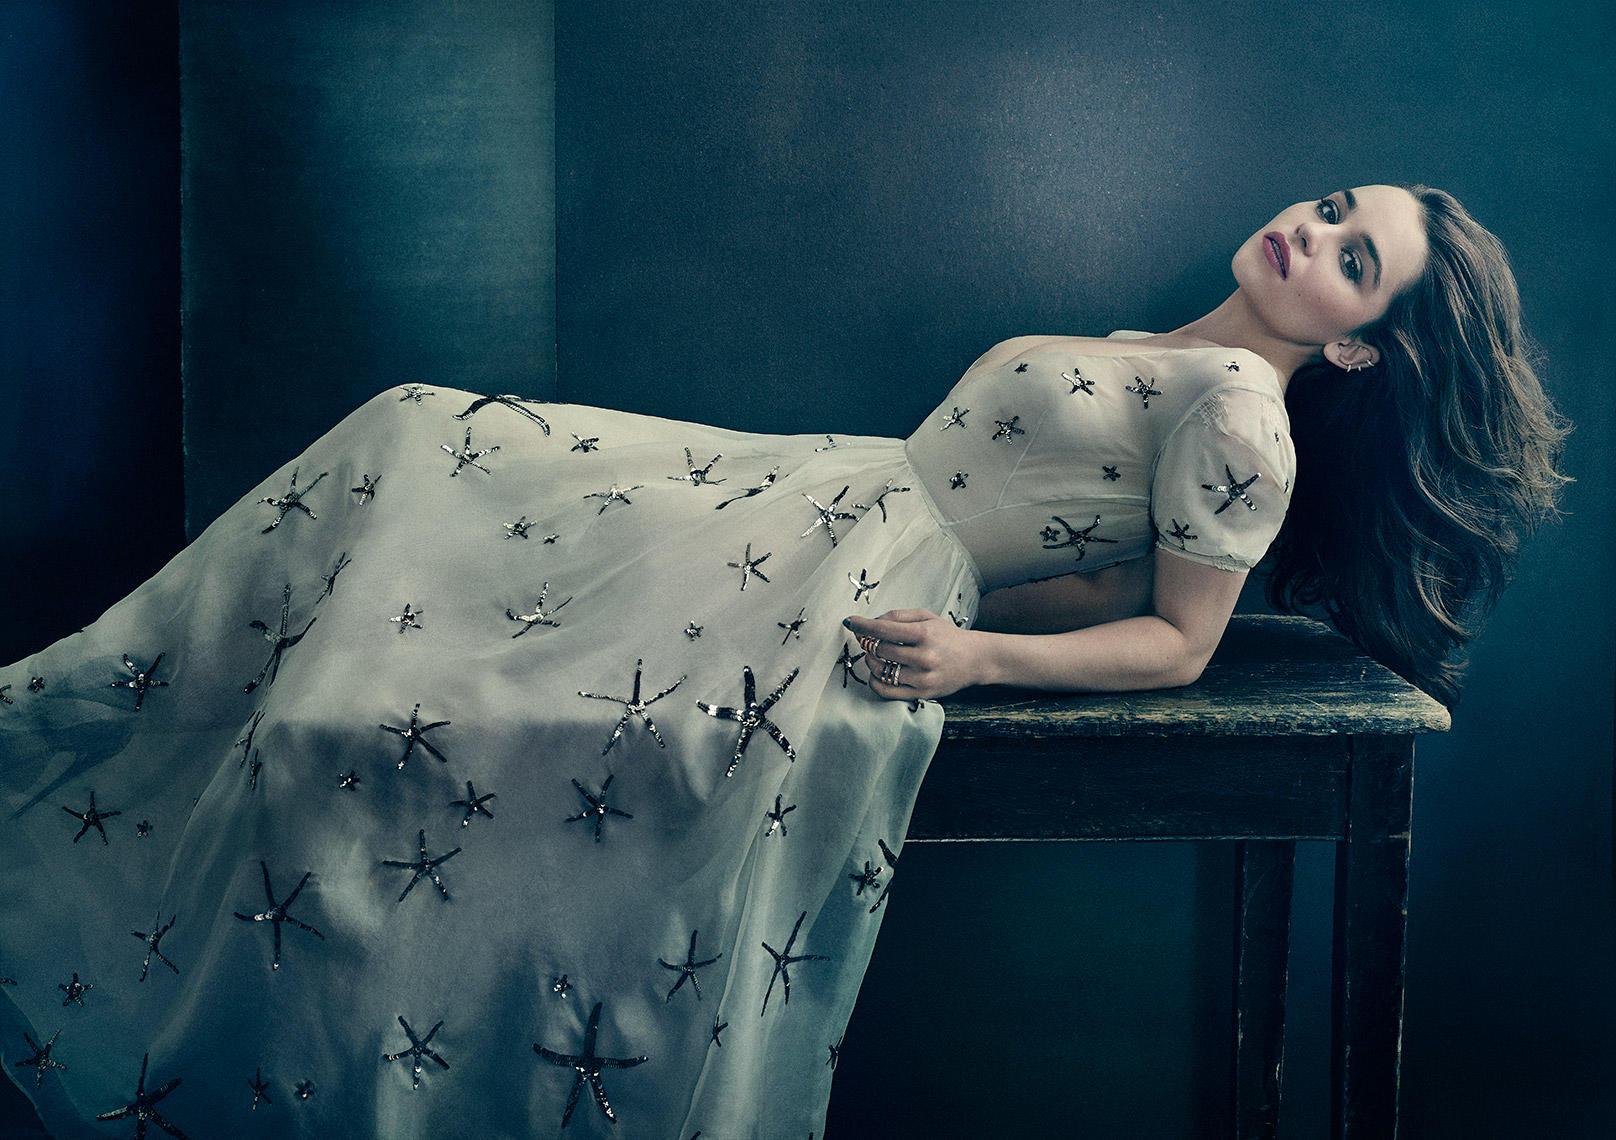 Emilia clarke photoshoot stills